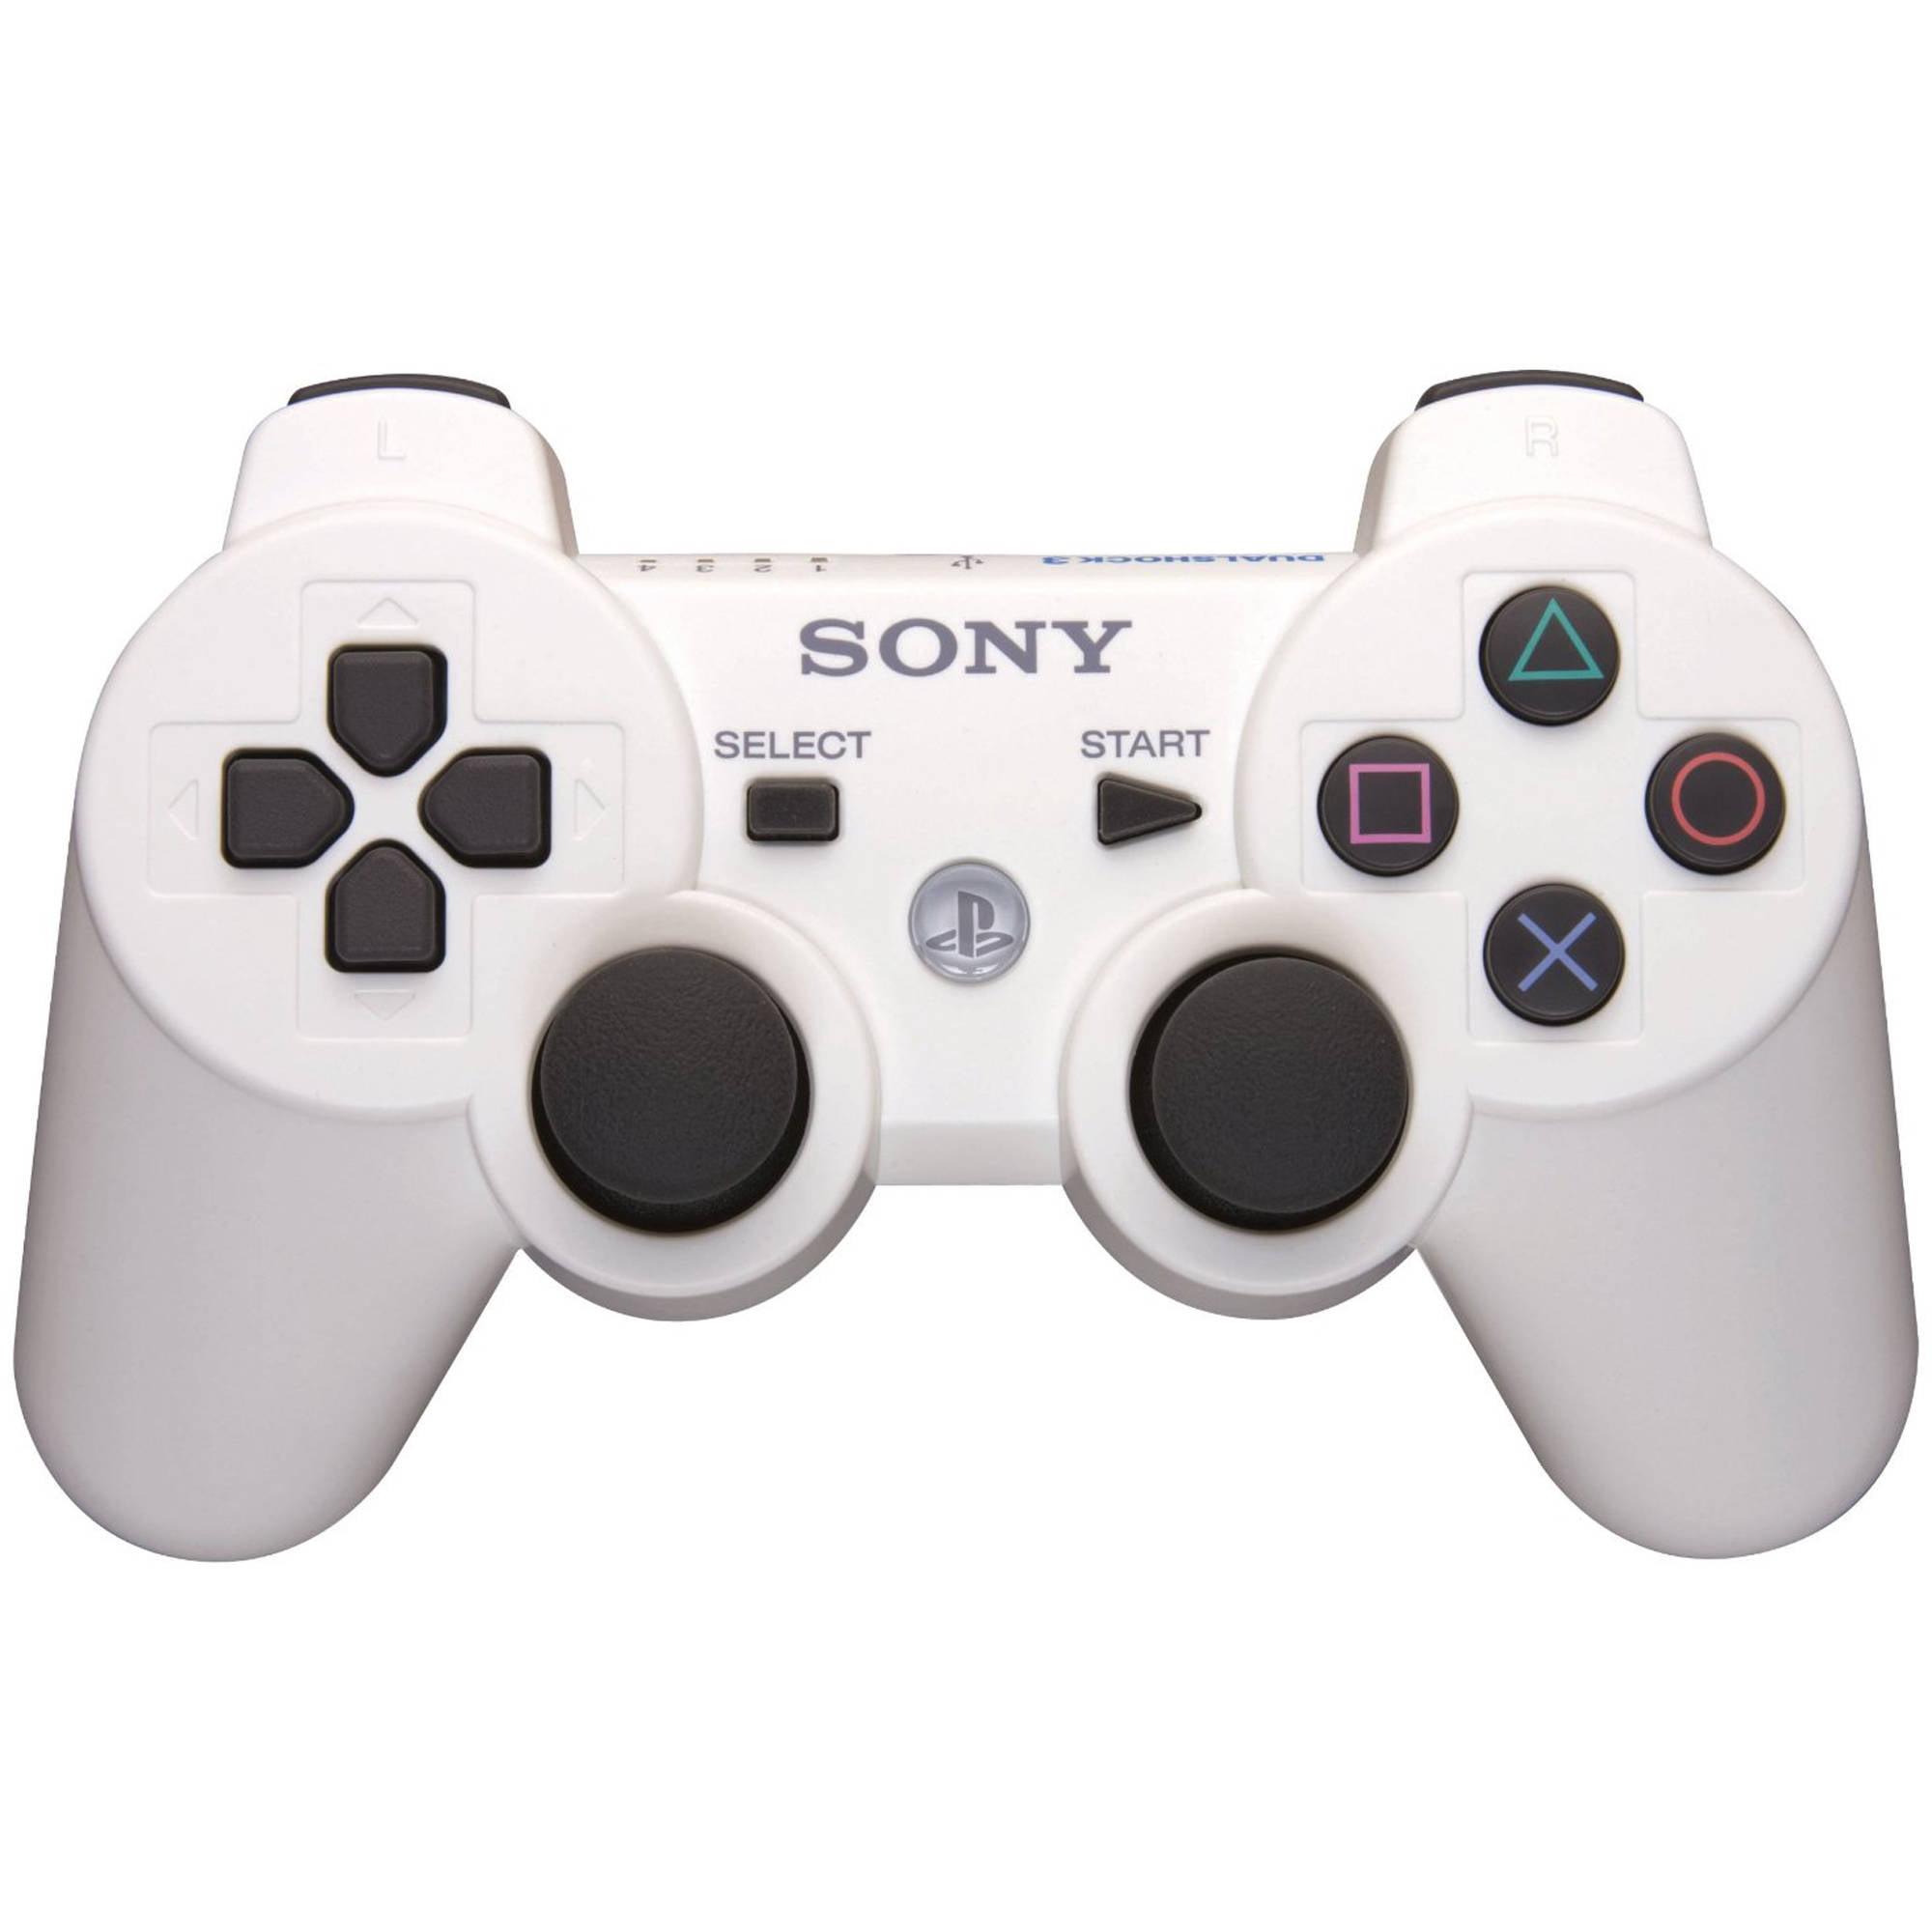 SONY 99013 PlayStation(R)3 DUALSHOCK(R)3 Wireless Controller (White)